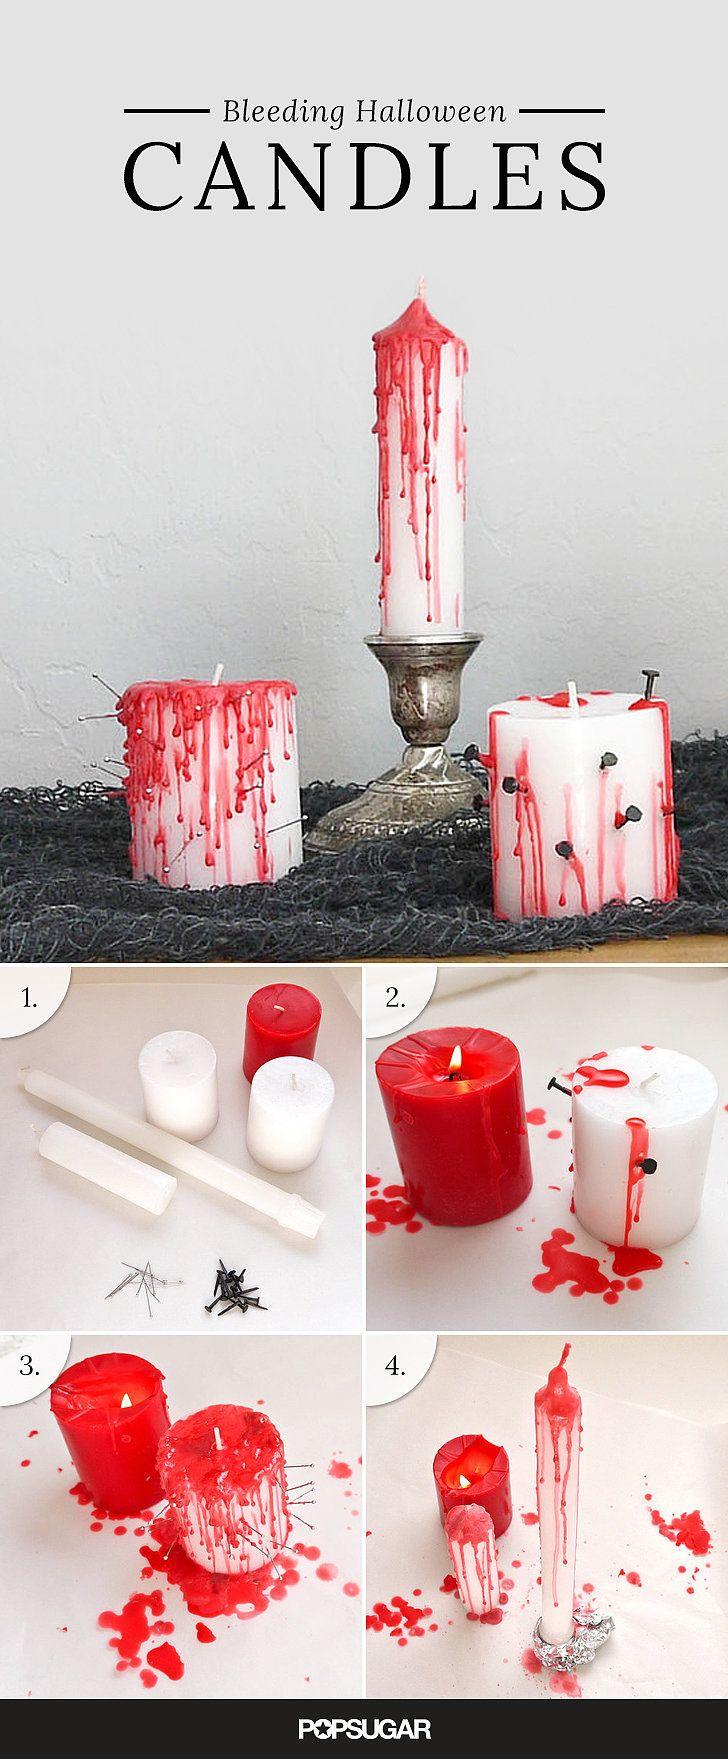 Diy halloween wedding decorations  Oh the Gore DIY Bleeding Halloween Candles  Crazy Holidays